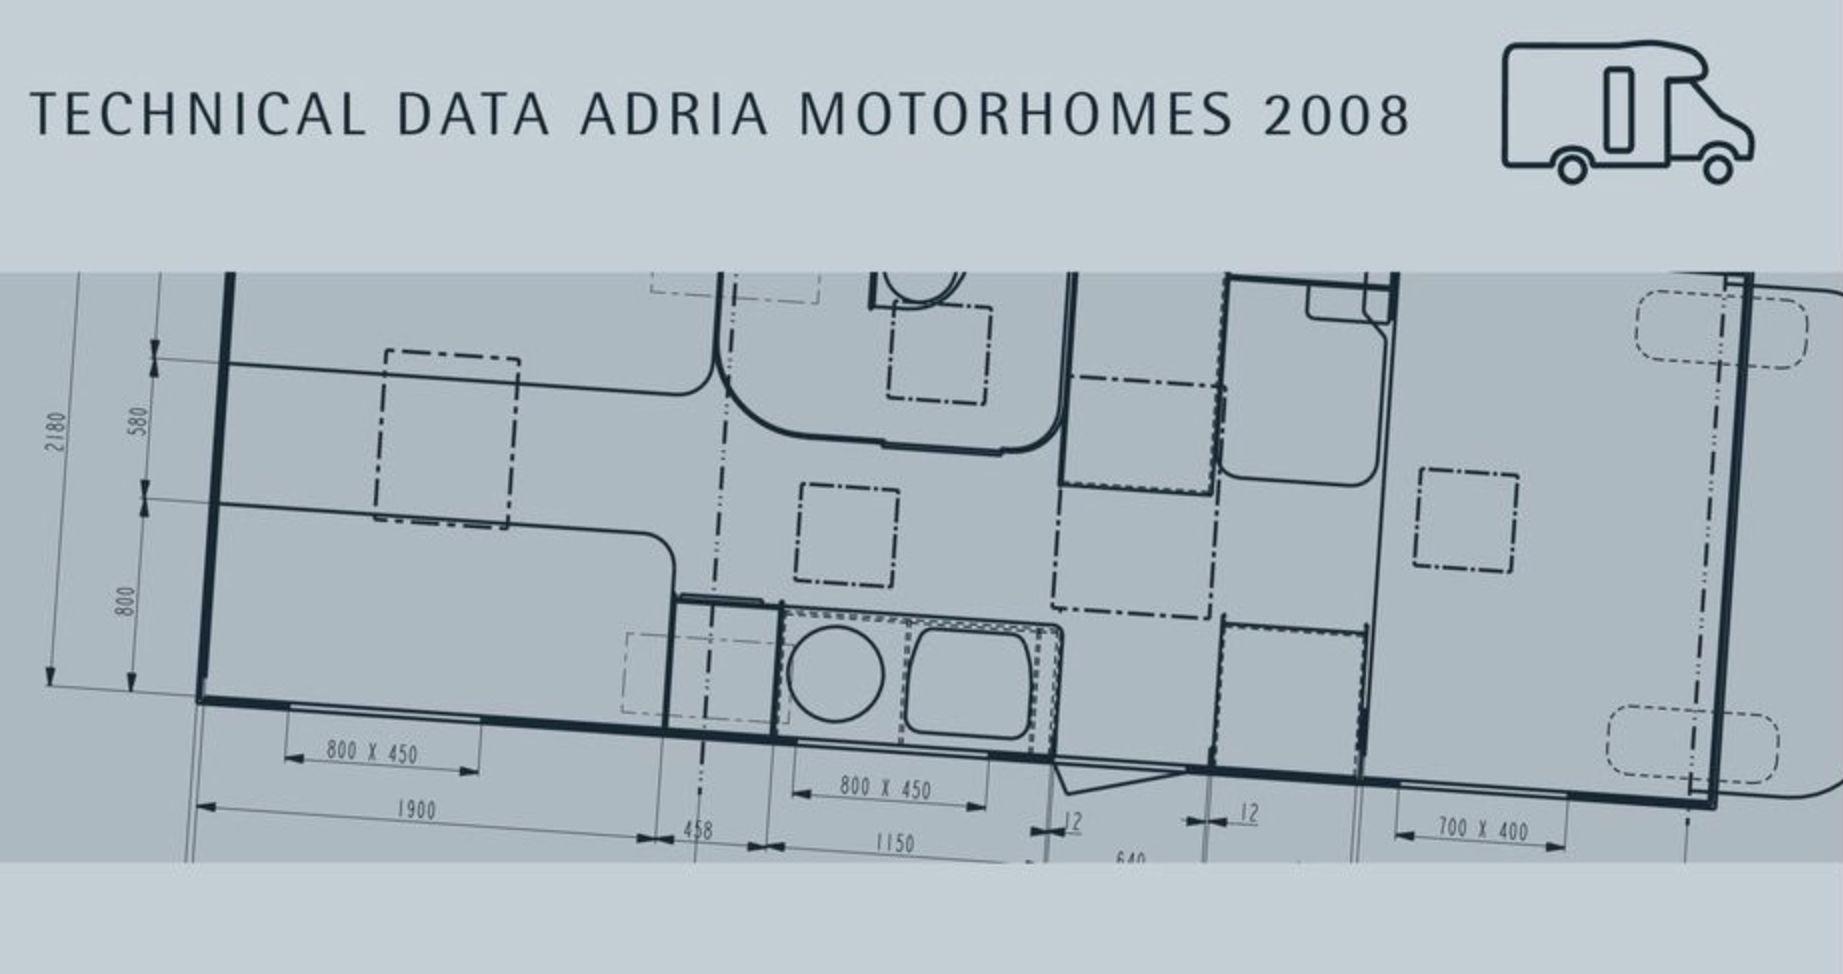 Adria Caravan Wiring Diagram | Adria Caravan Wiring Diagram |  | Pinterest